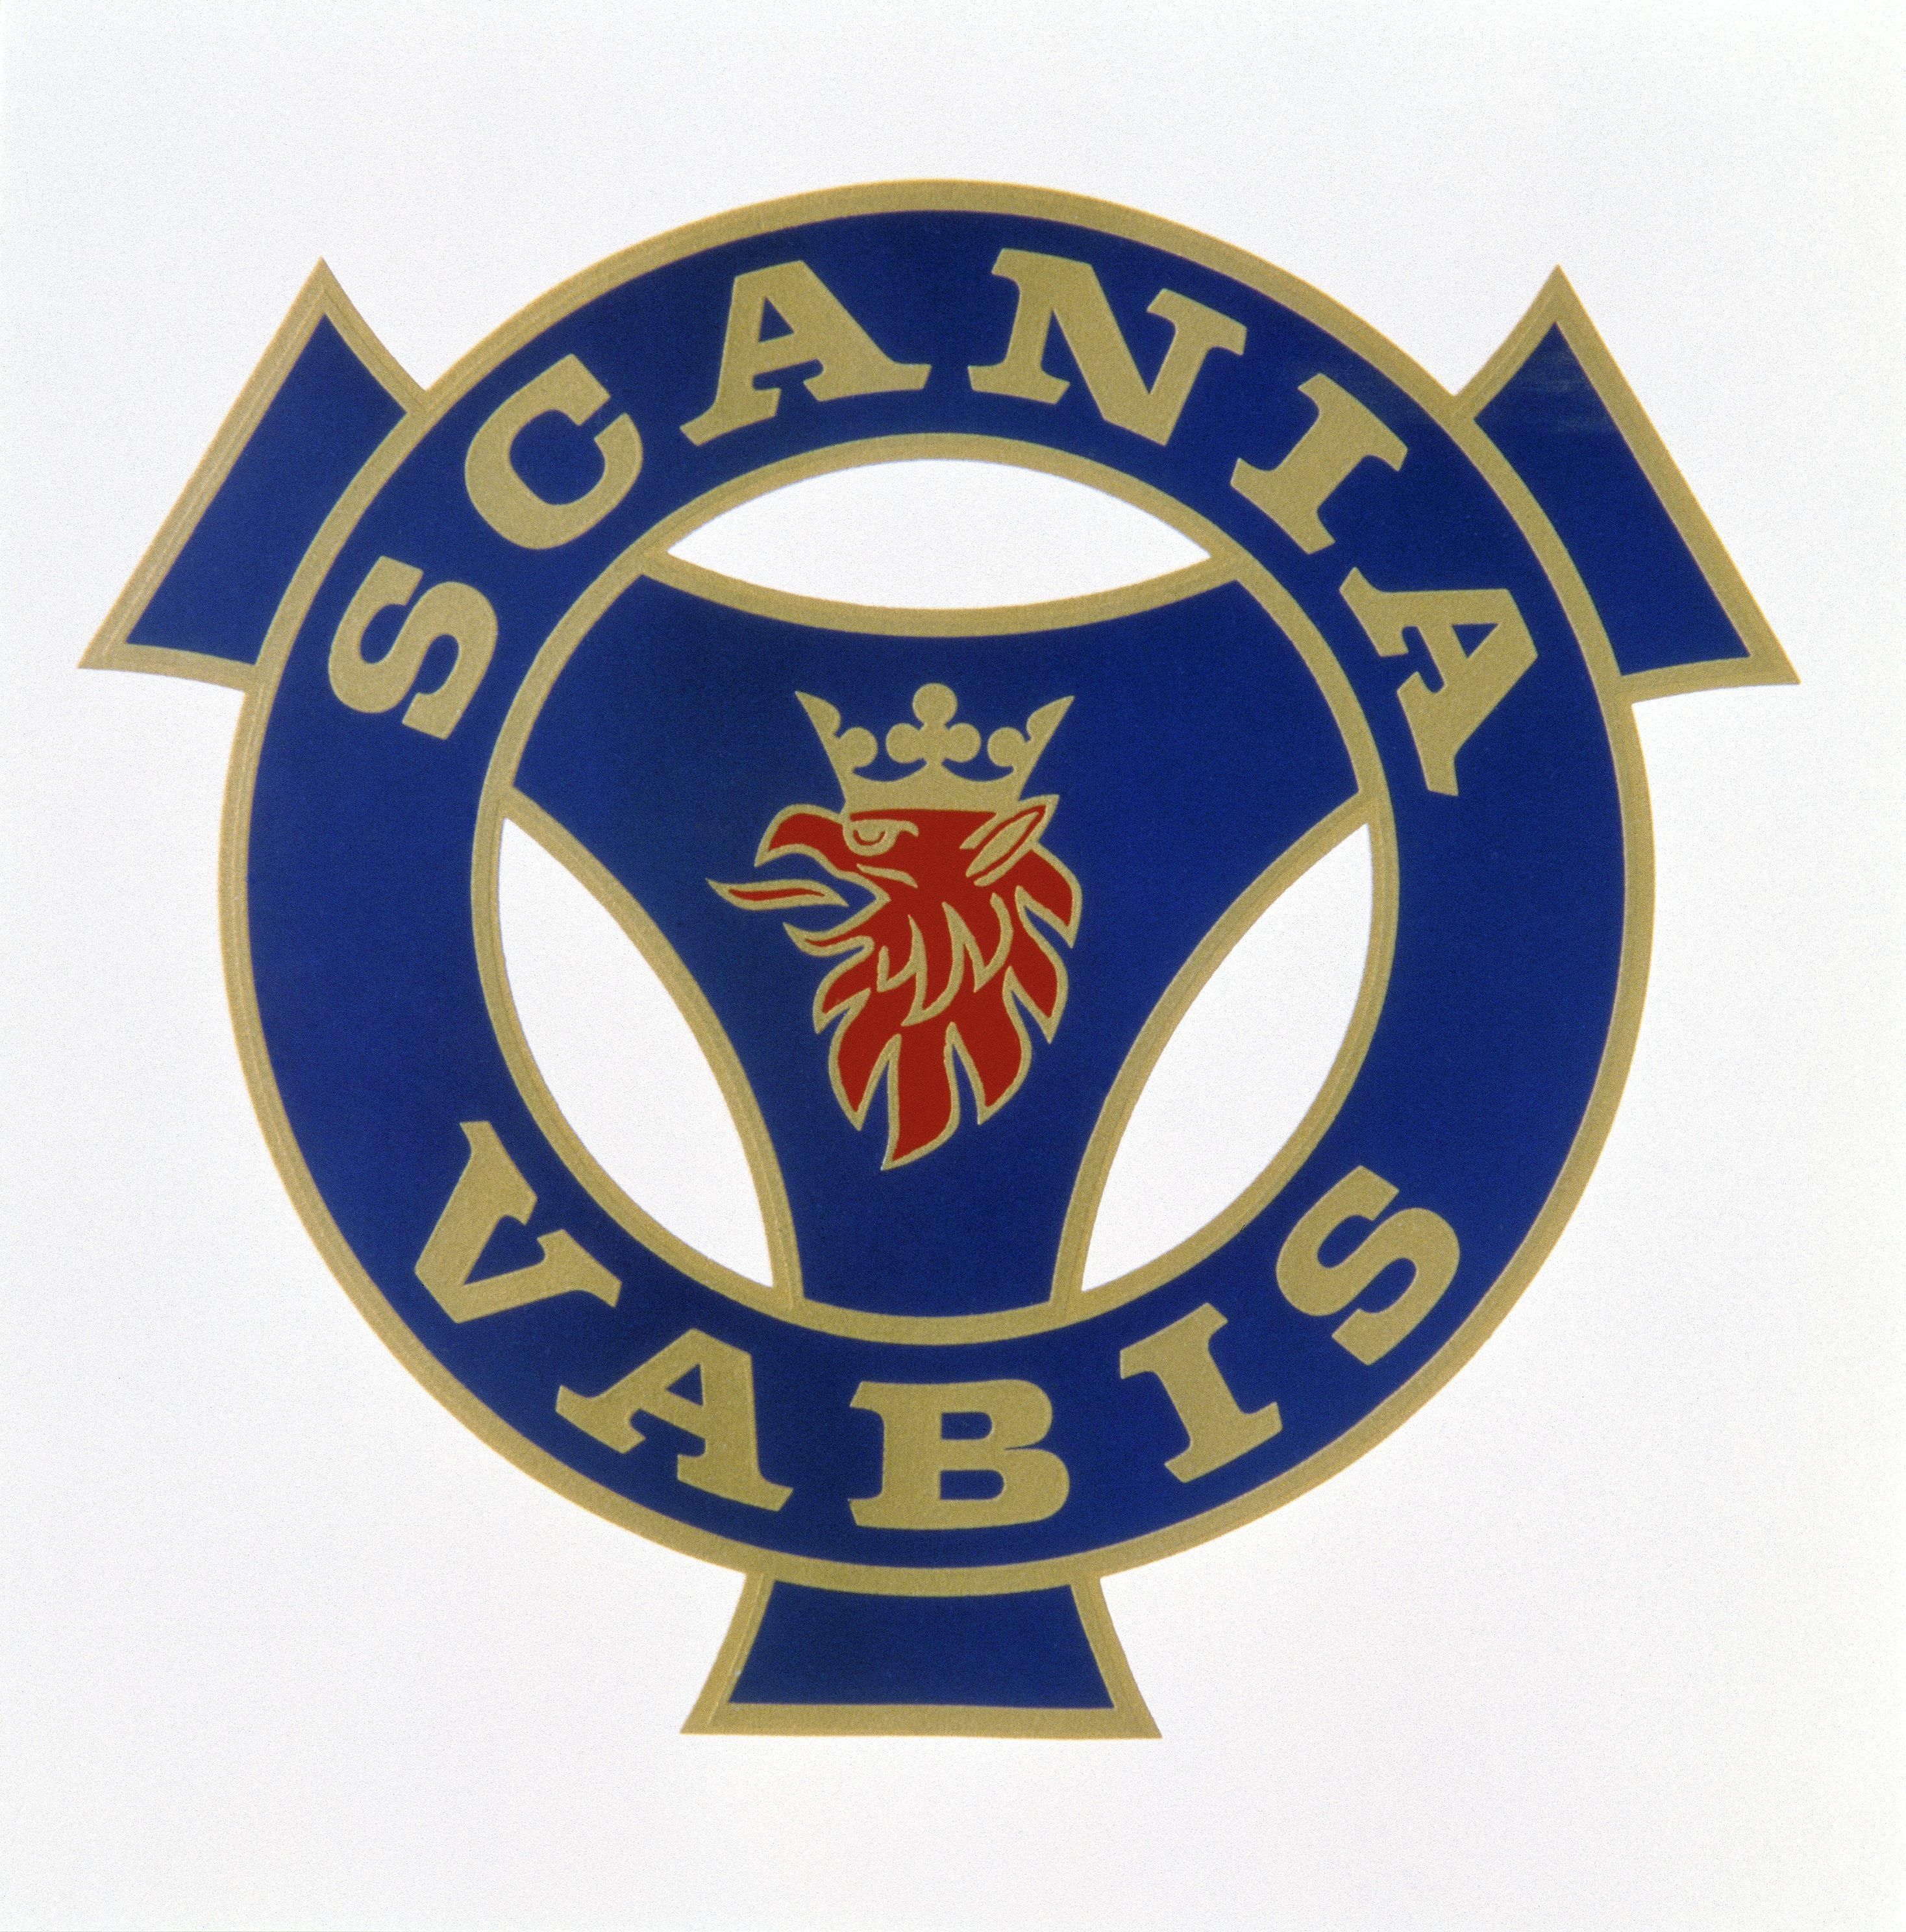 Scania Symbol Wallpaper